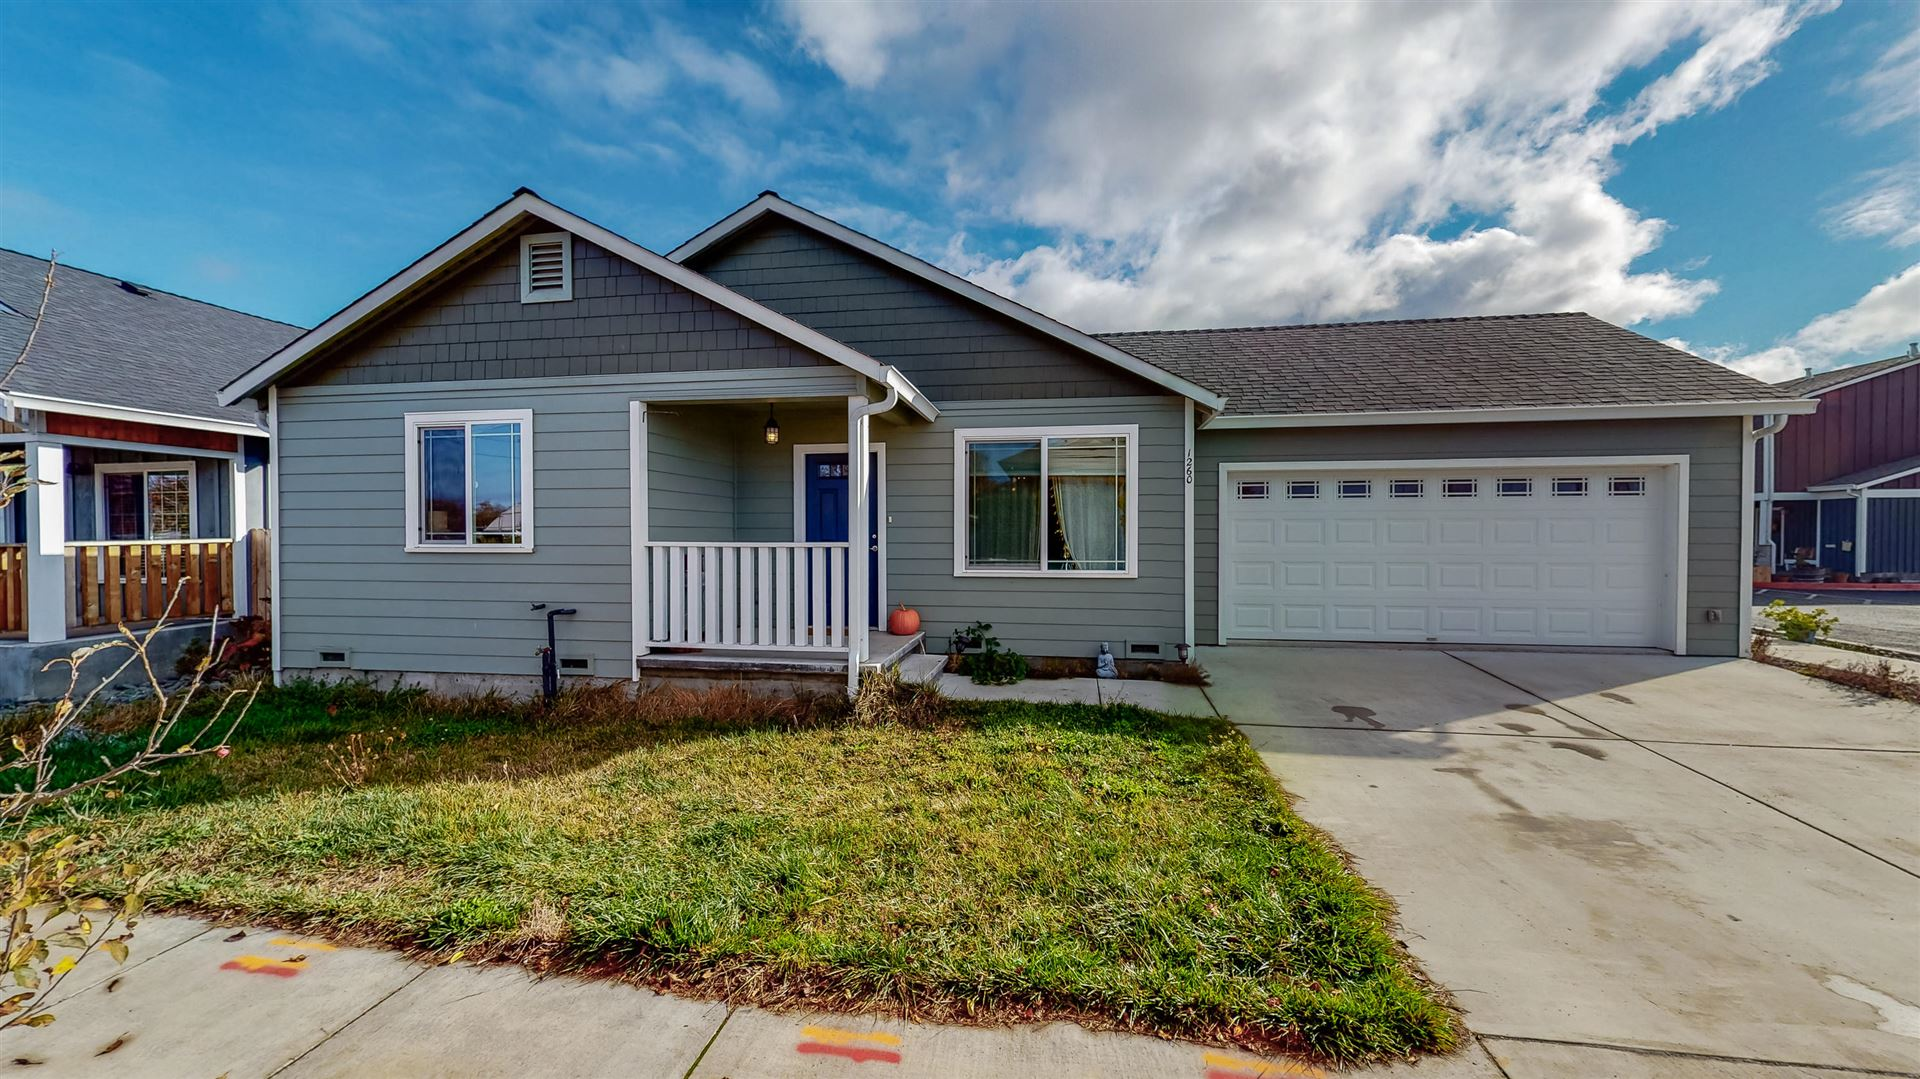 1260 O Street, Arcata, CA 95521 - MLS#: 257911